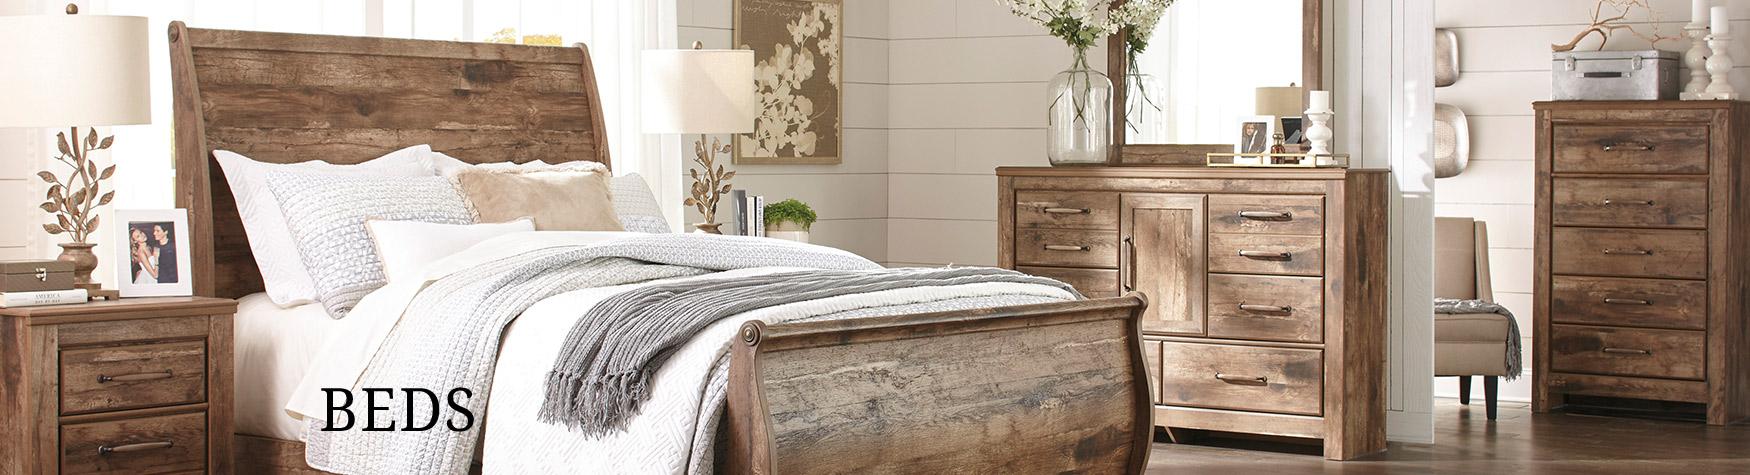 beds-banner-1.jpg